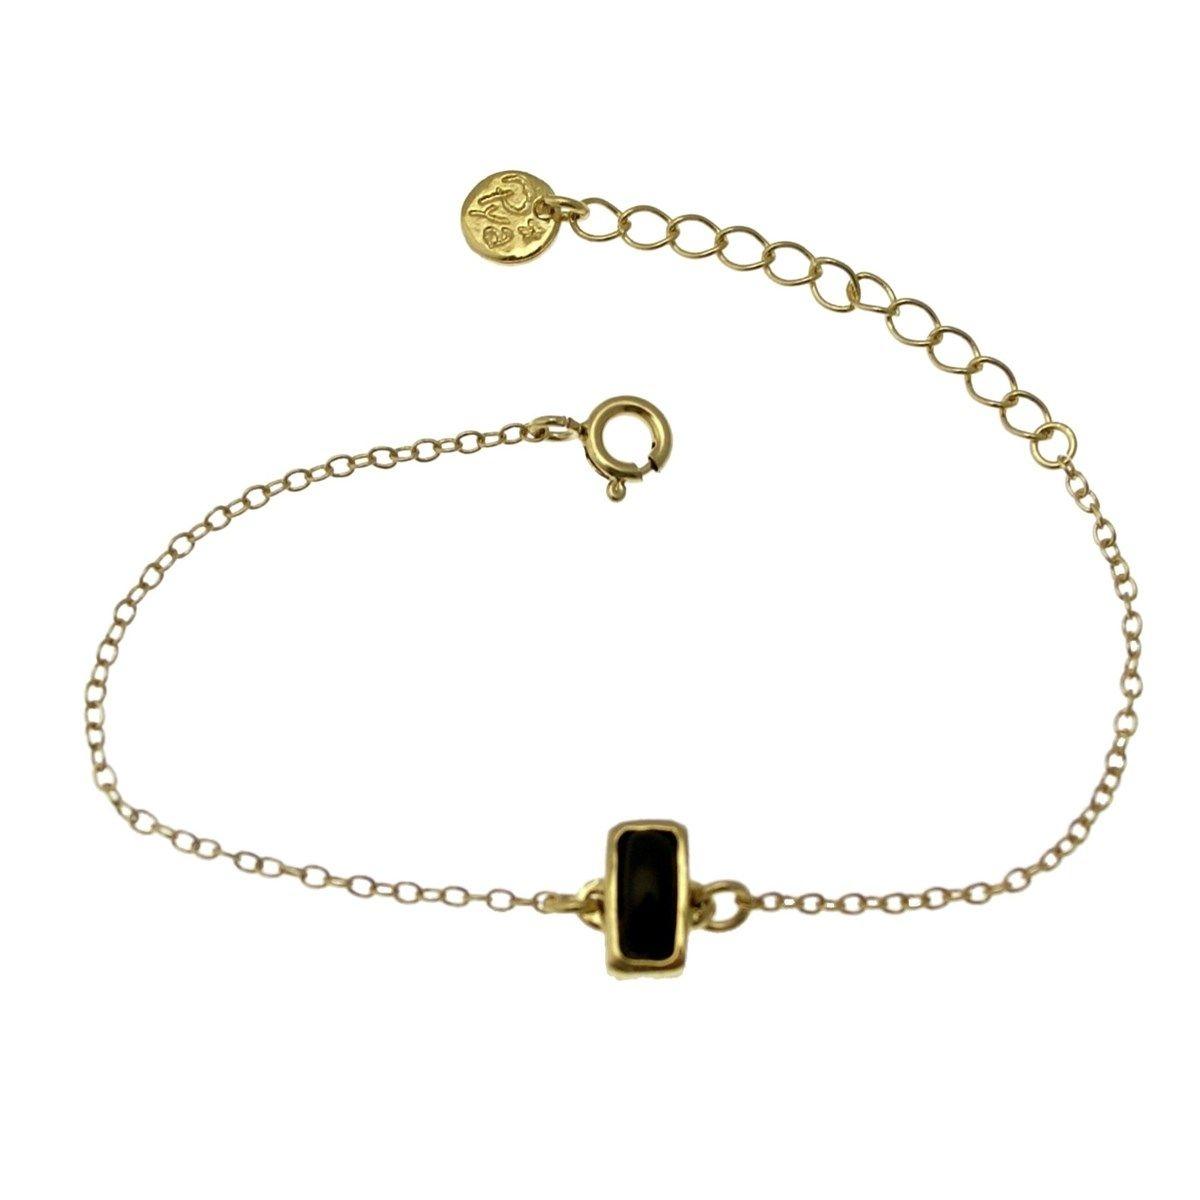 Bracelet simple collection Pya TUPAI by LILI la PIE